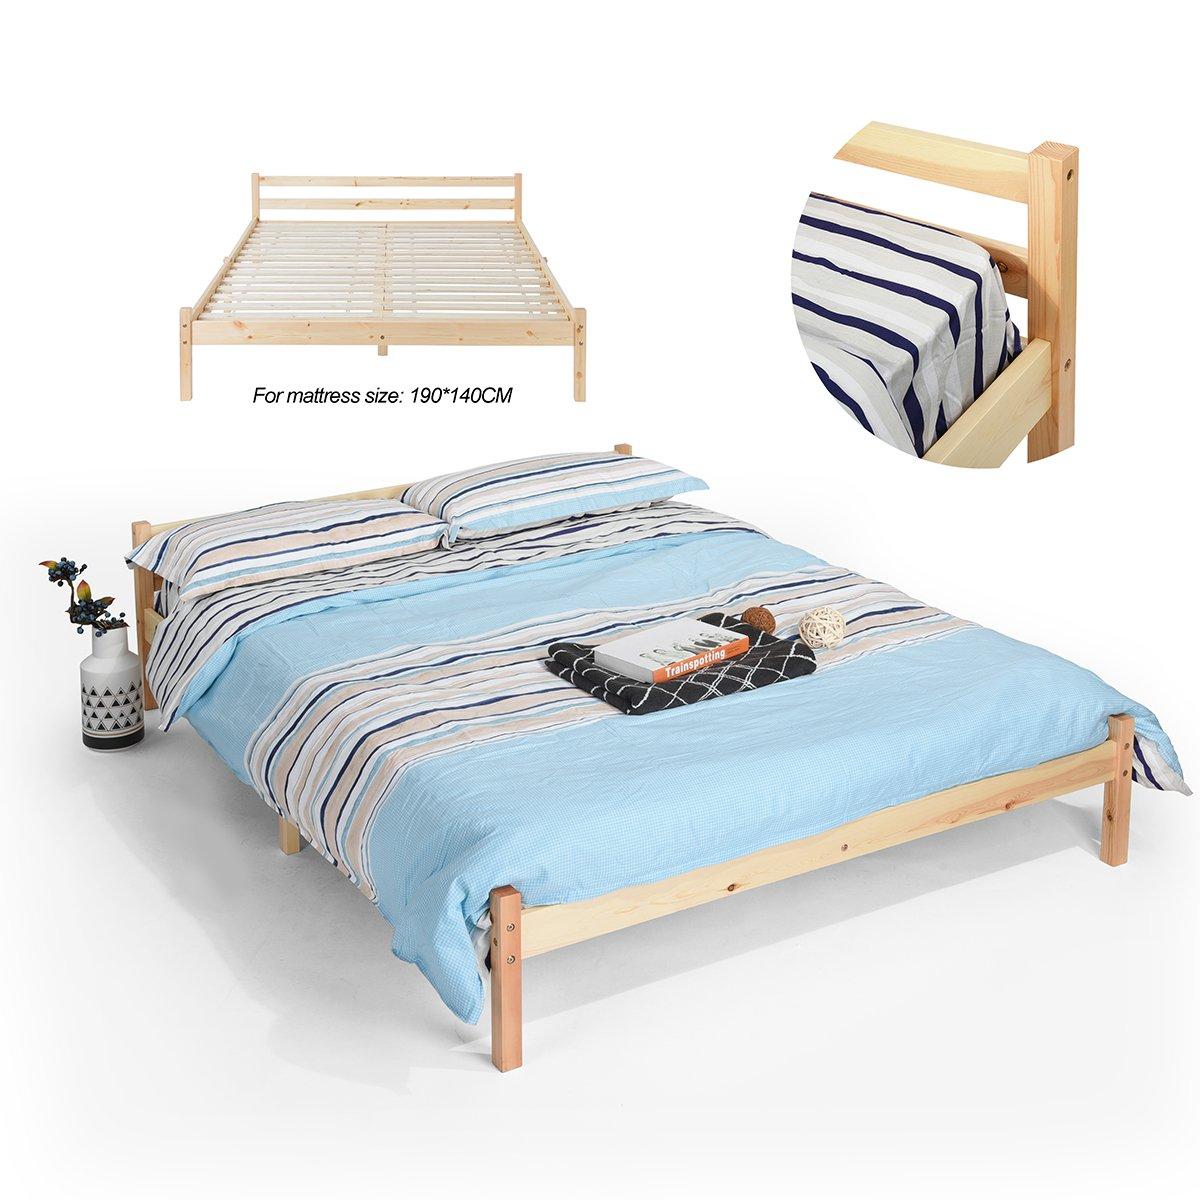 pheobehouse Natur Holz Bett Plattform (Twin, Full), Holz, Weiß ...